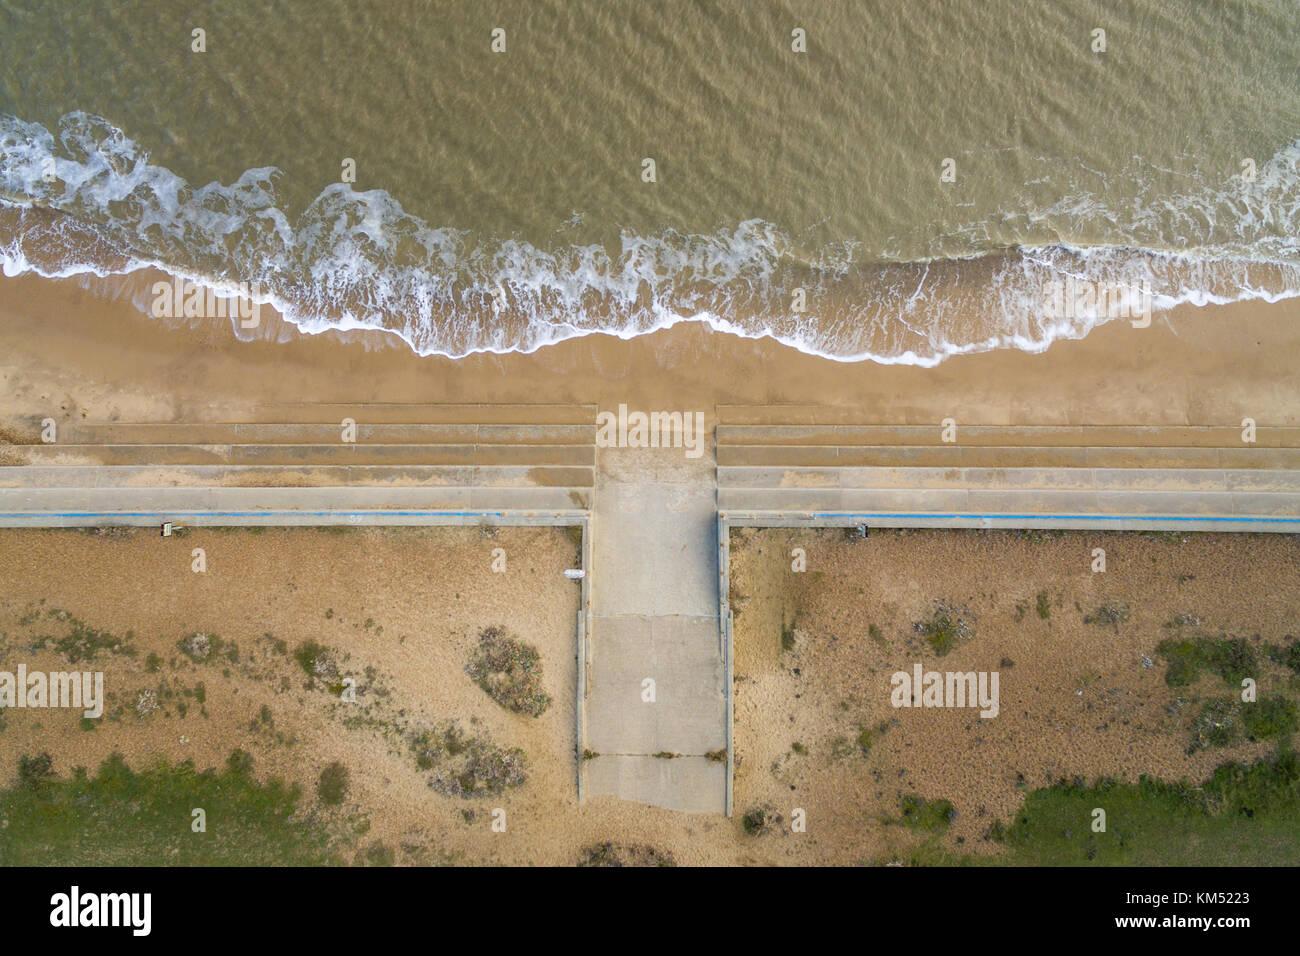 Aerial view of beach at Felixstowe, Suffolk, UK - Stock Image